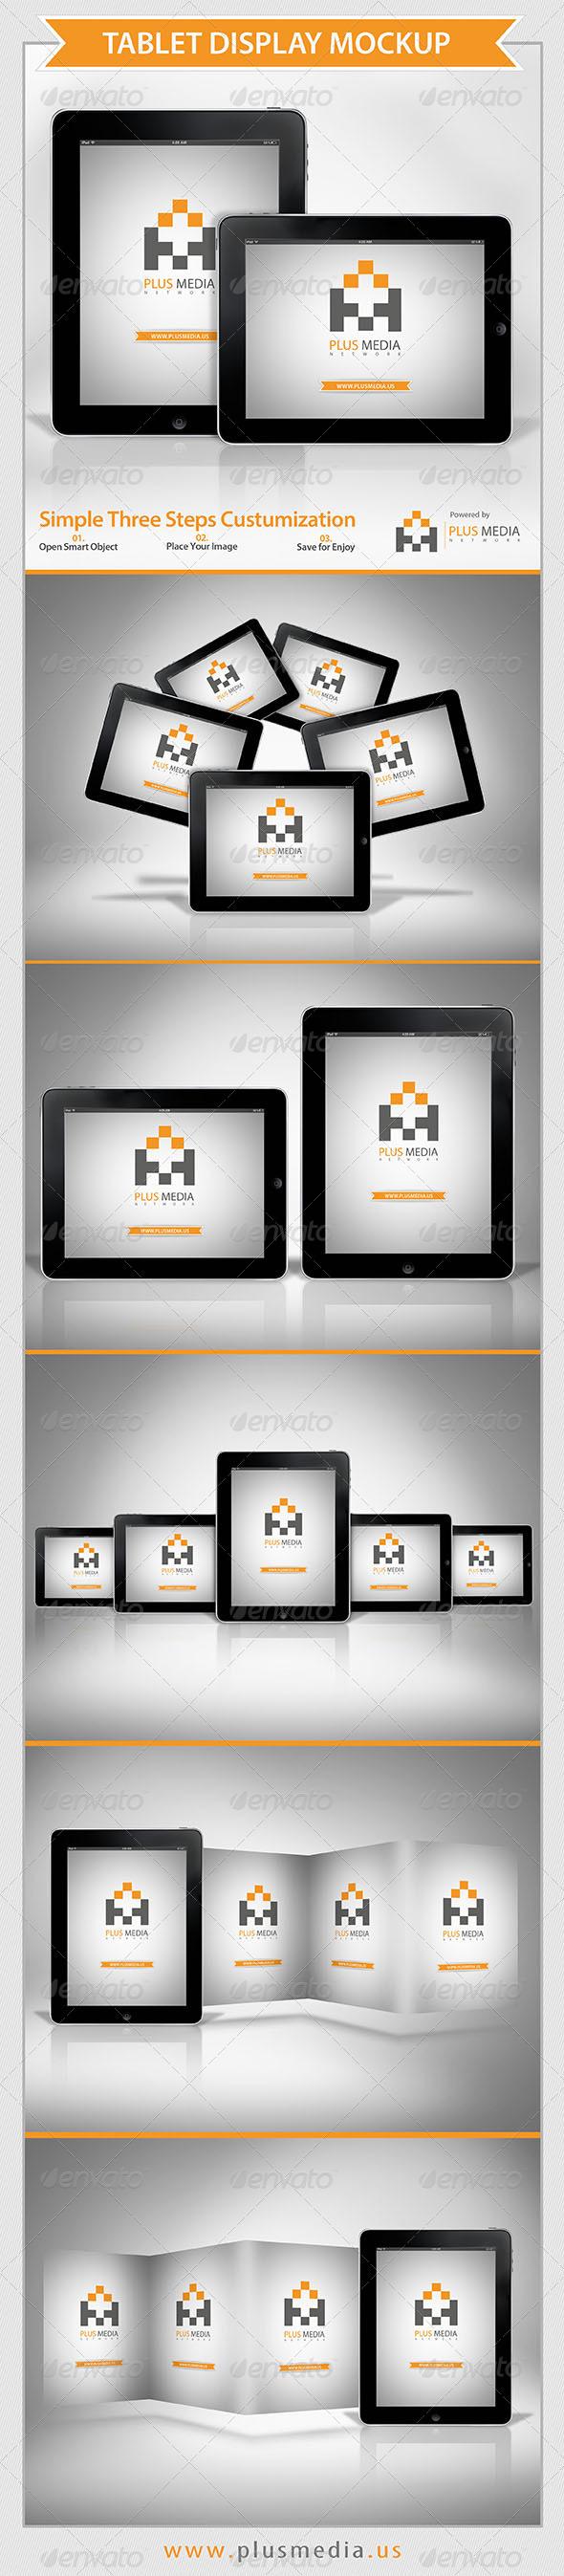 Tablet Display Mockup - Mobile Displays